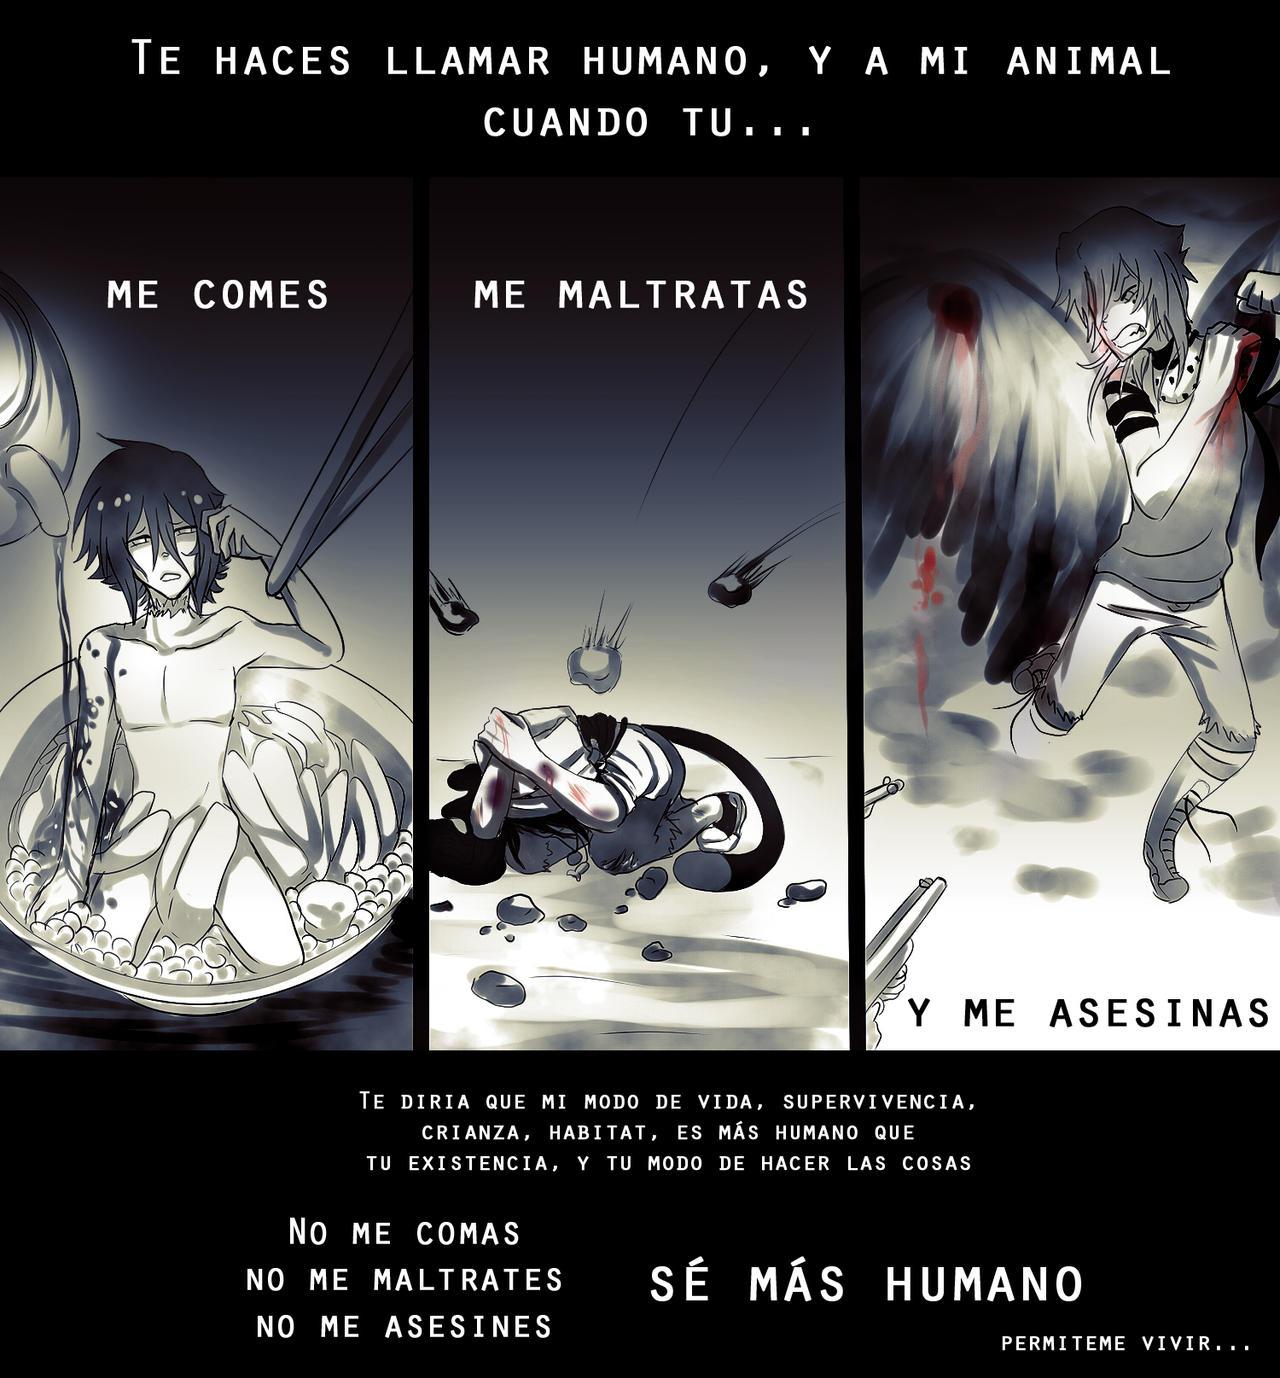 http://fc00.deviantart.net/fs71/i/2012/074/5/e/zoogroup___maltrato_animal_by_matt_loveless-d4swc5d.jpg